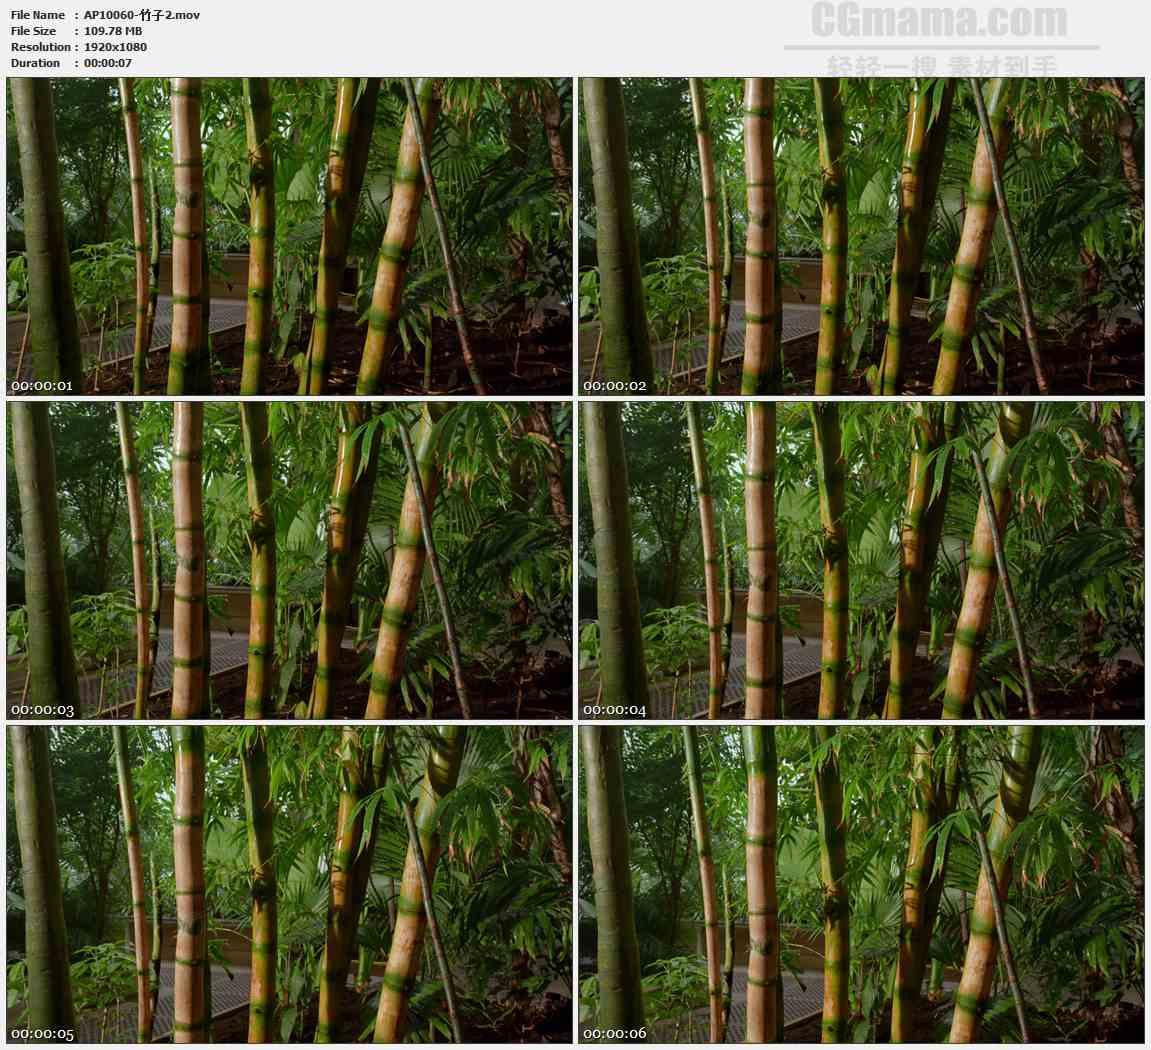 AP10060-竹林竹子竹节高清实拍视频素材